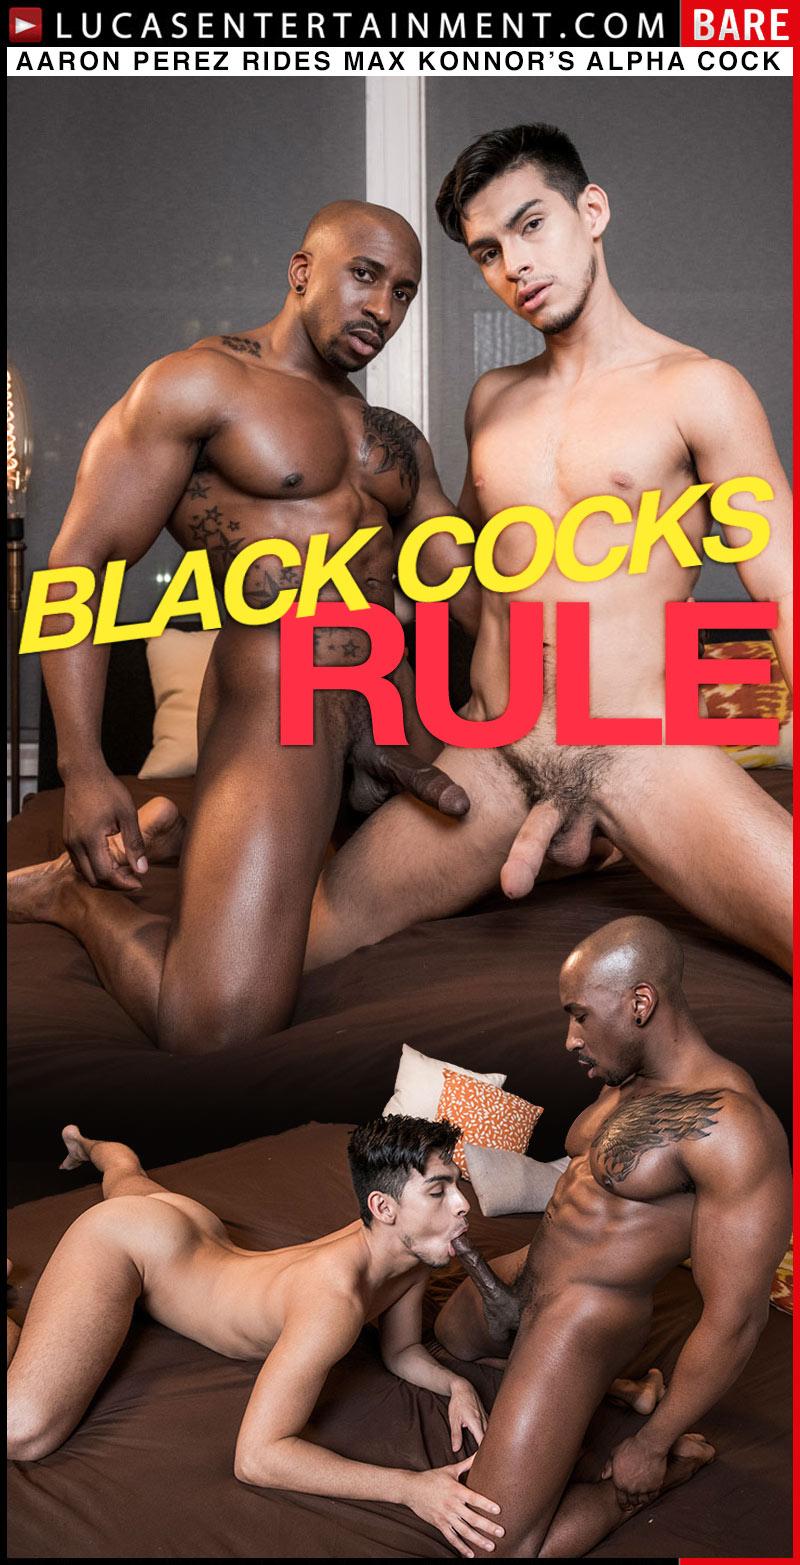 BLACK COCKS RULE, Scene 4 (Max Konnor Fucks Aaron Perez) at Lucas Entertainment